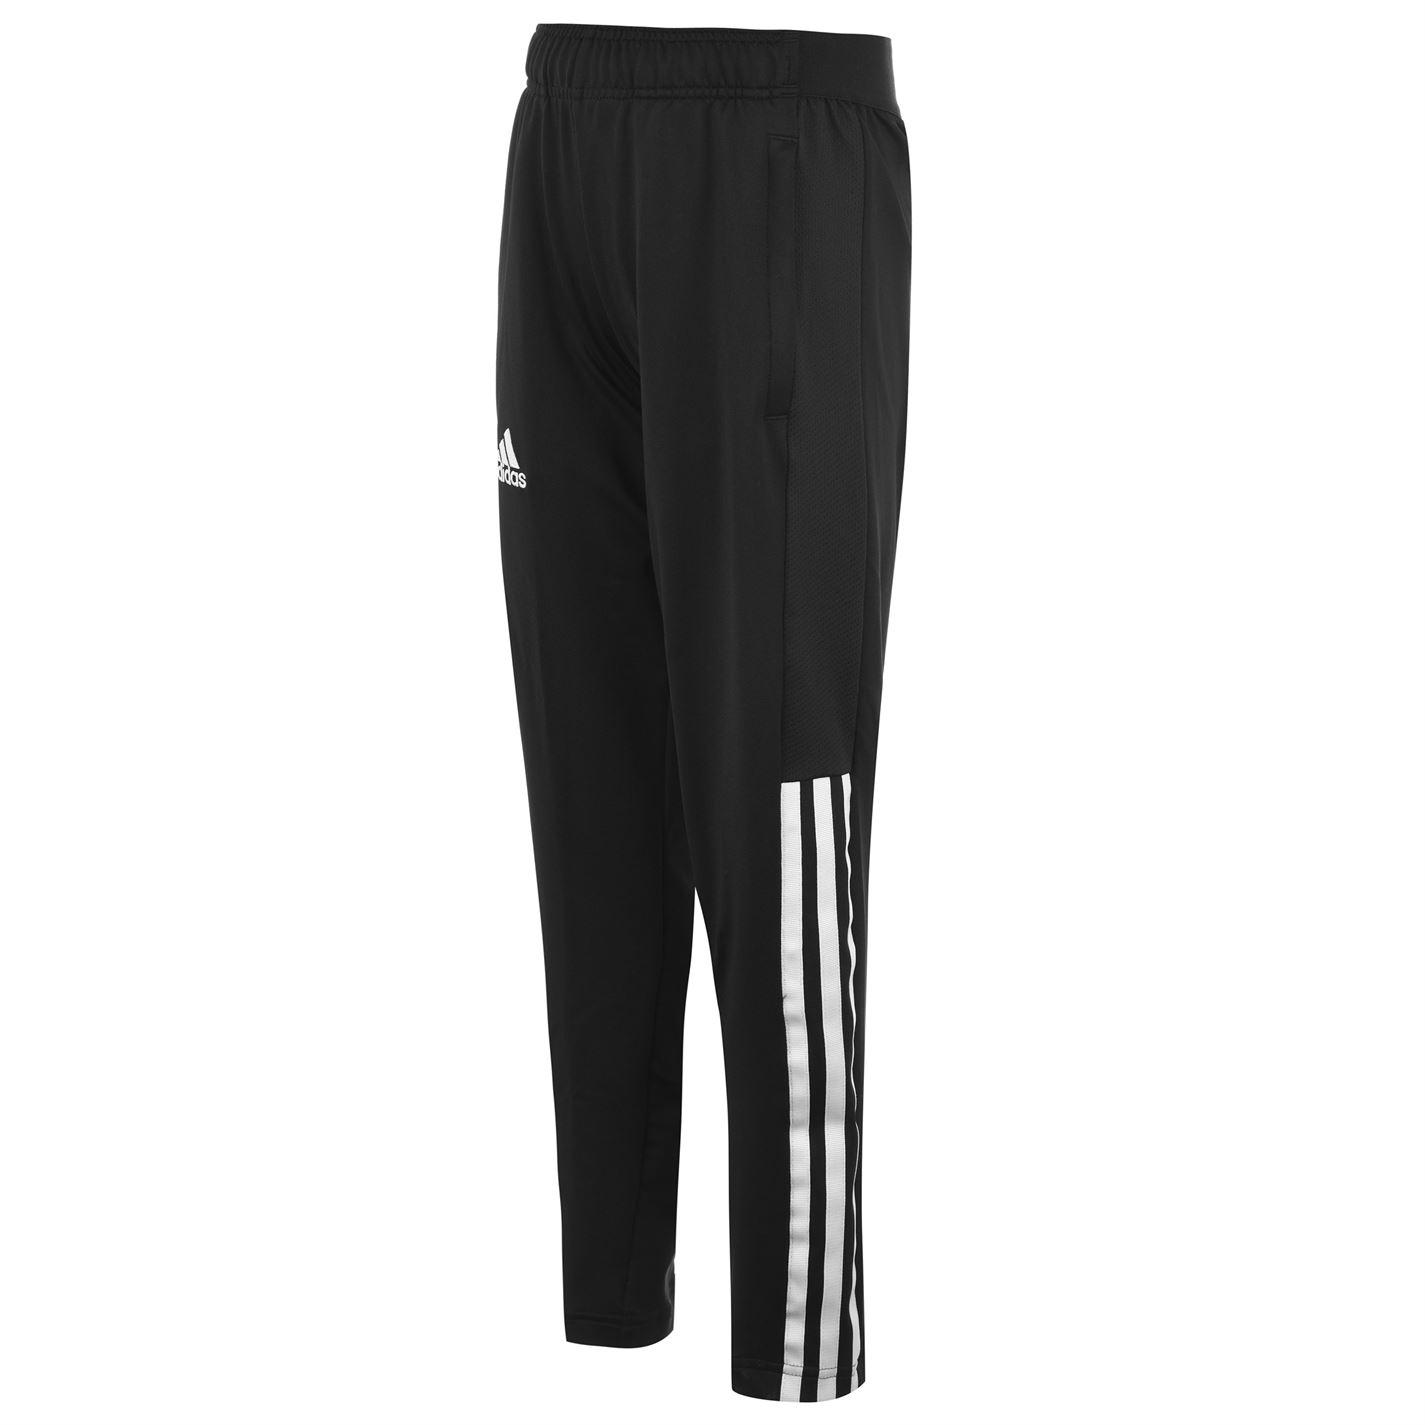 Adidas Climalite Pro Tracksuit Bottoms Boys